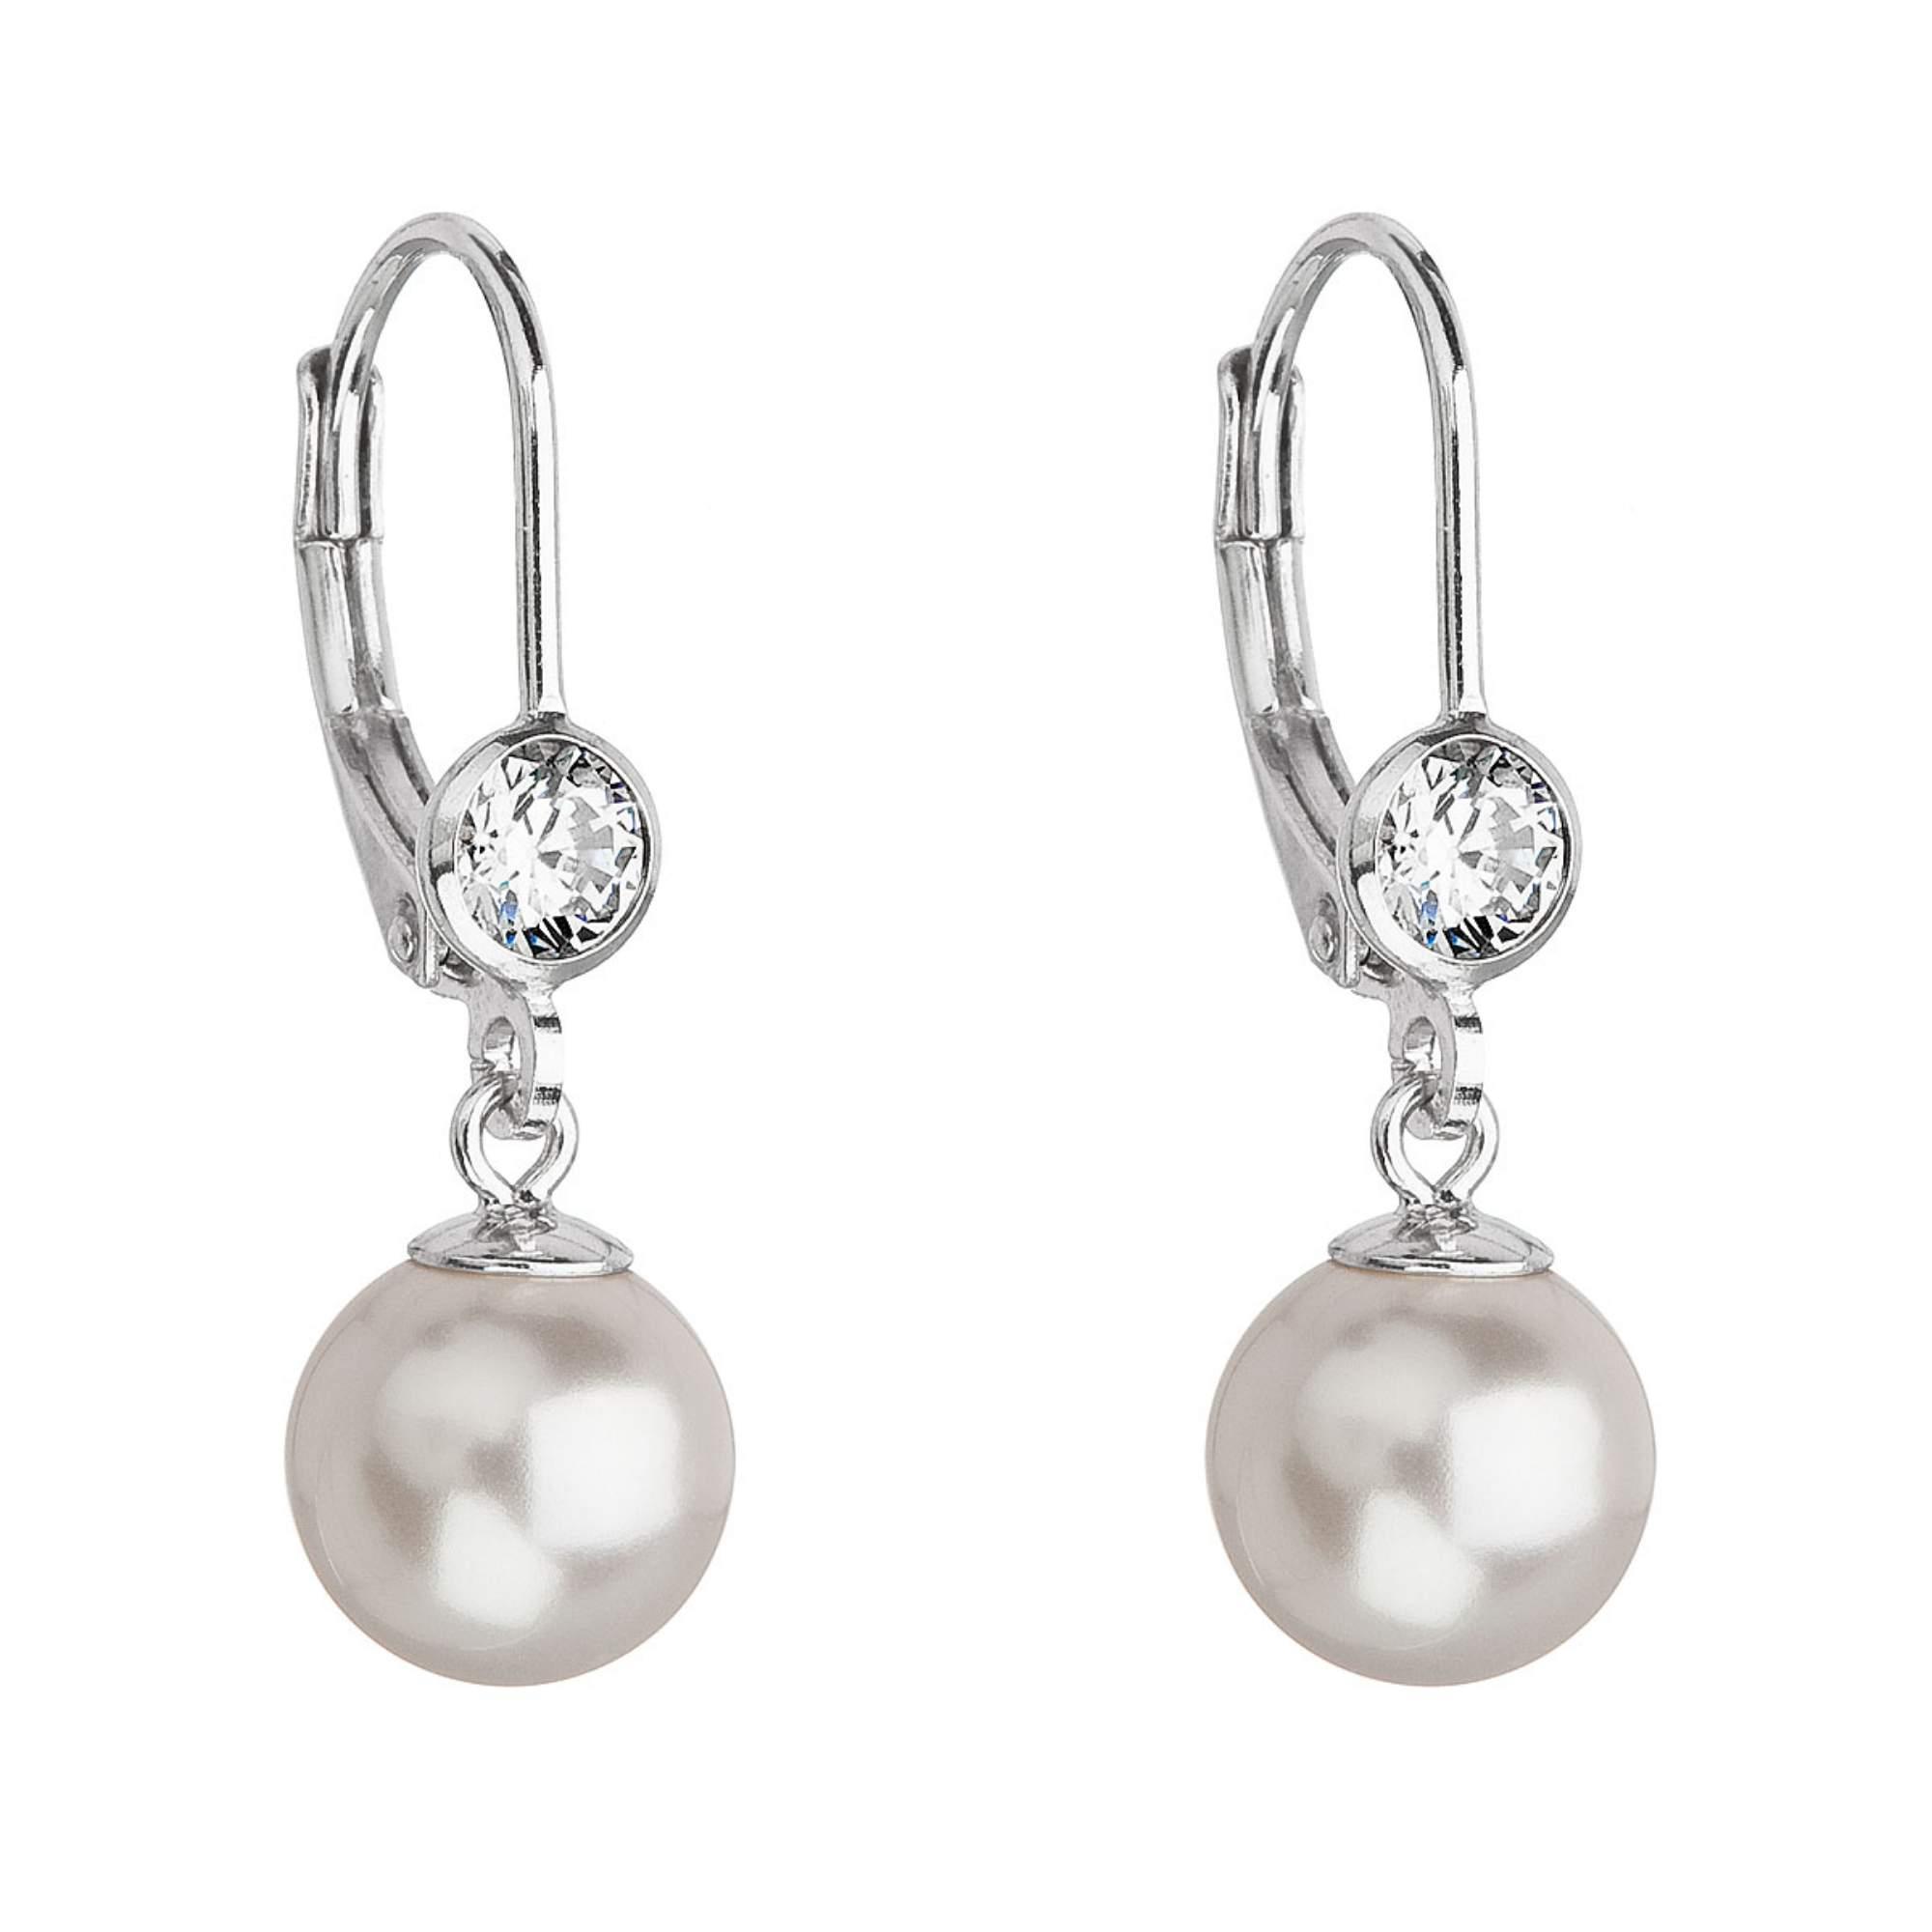 Stříbrné náušnice s perlou a kameny Crystals from Swarovski® White EG2074-WH